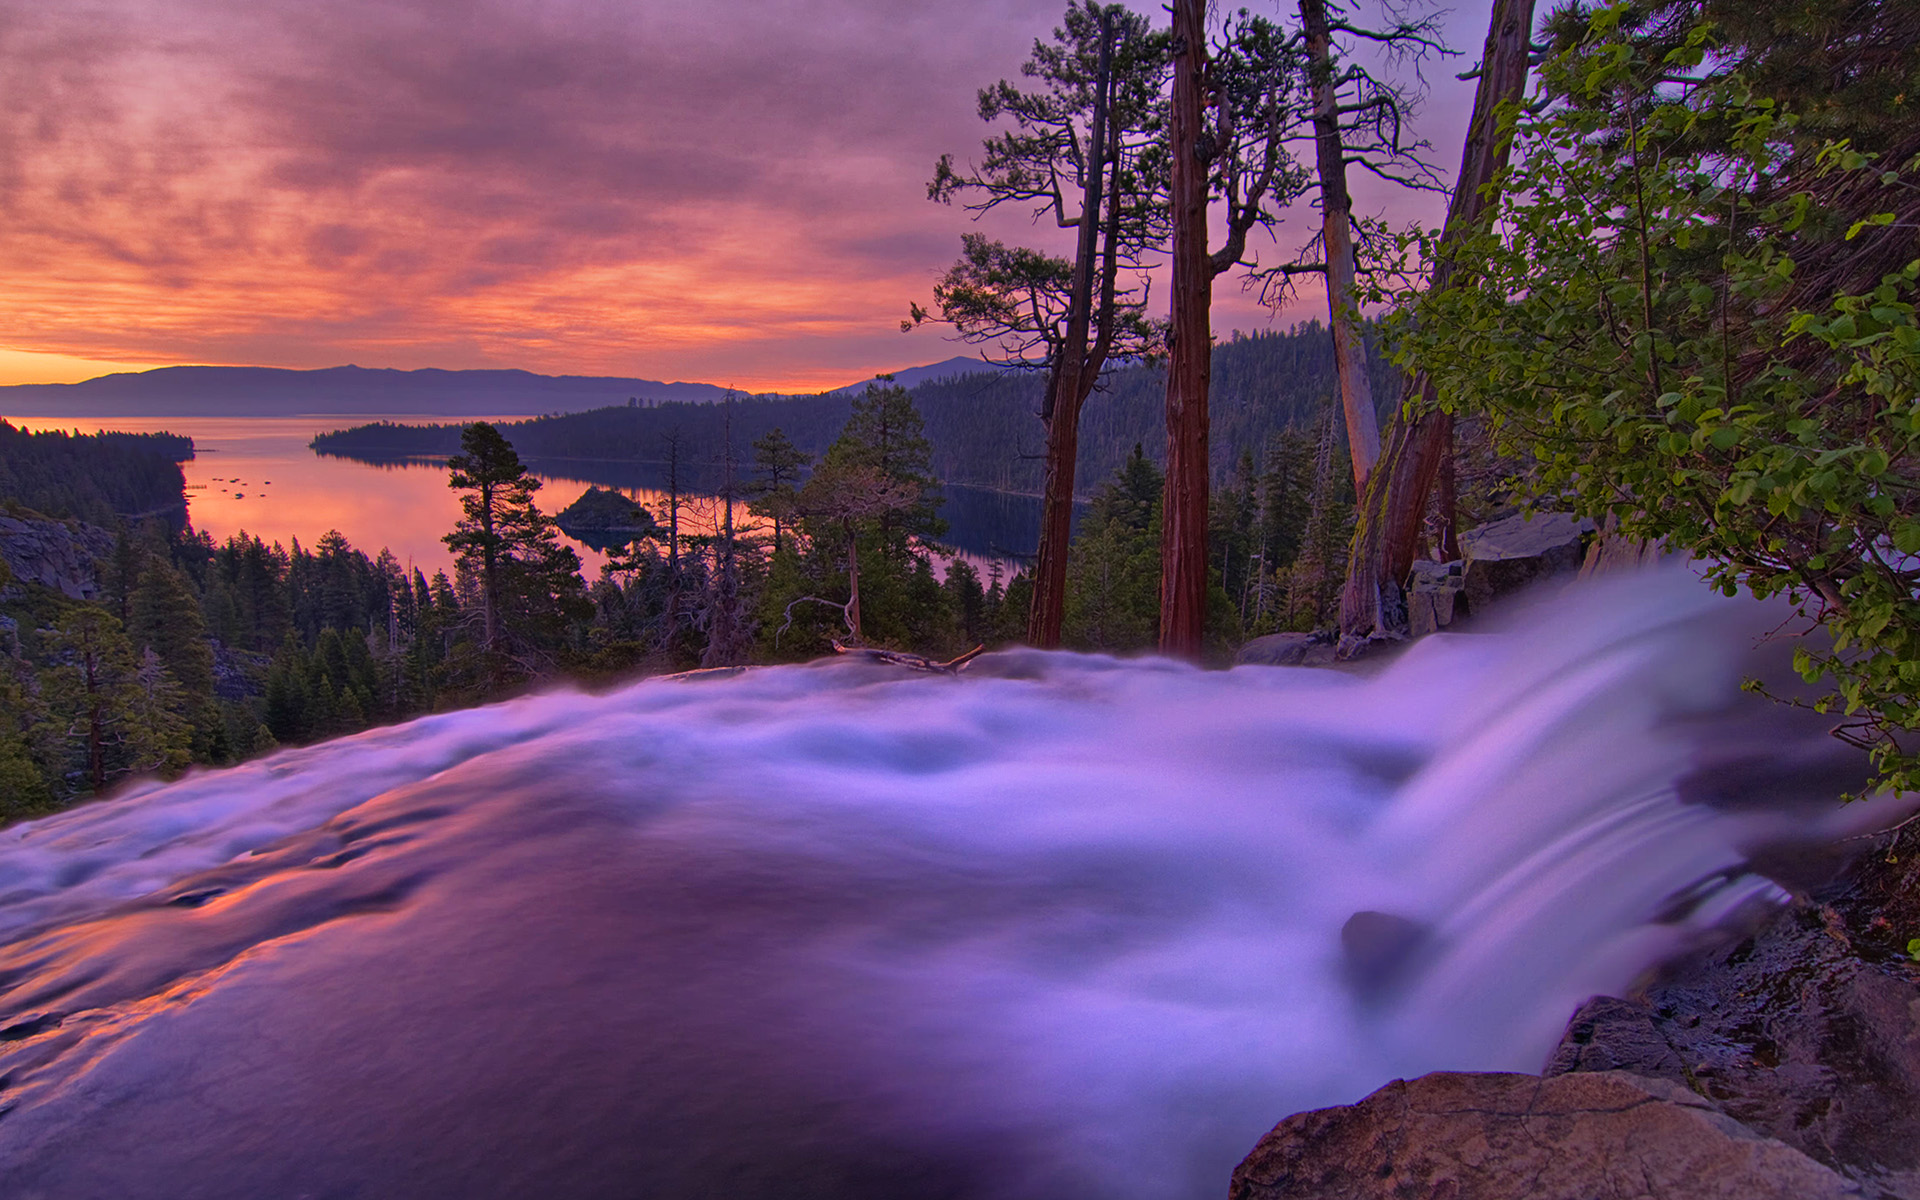 1920x1200 Fall Wallpaper Eagle Falls And Emerald Bay At Sunrise At Lake Tahoe In